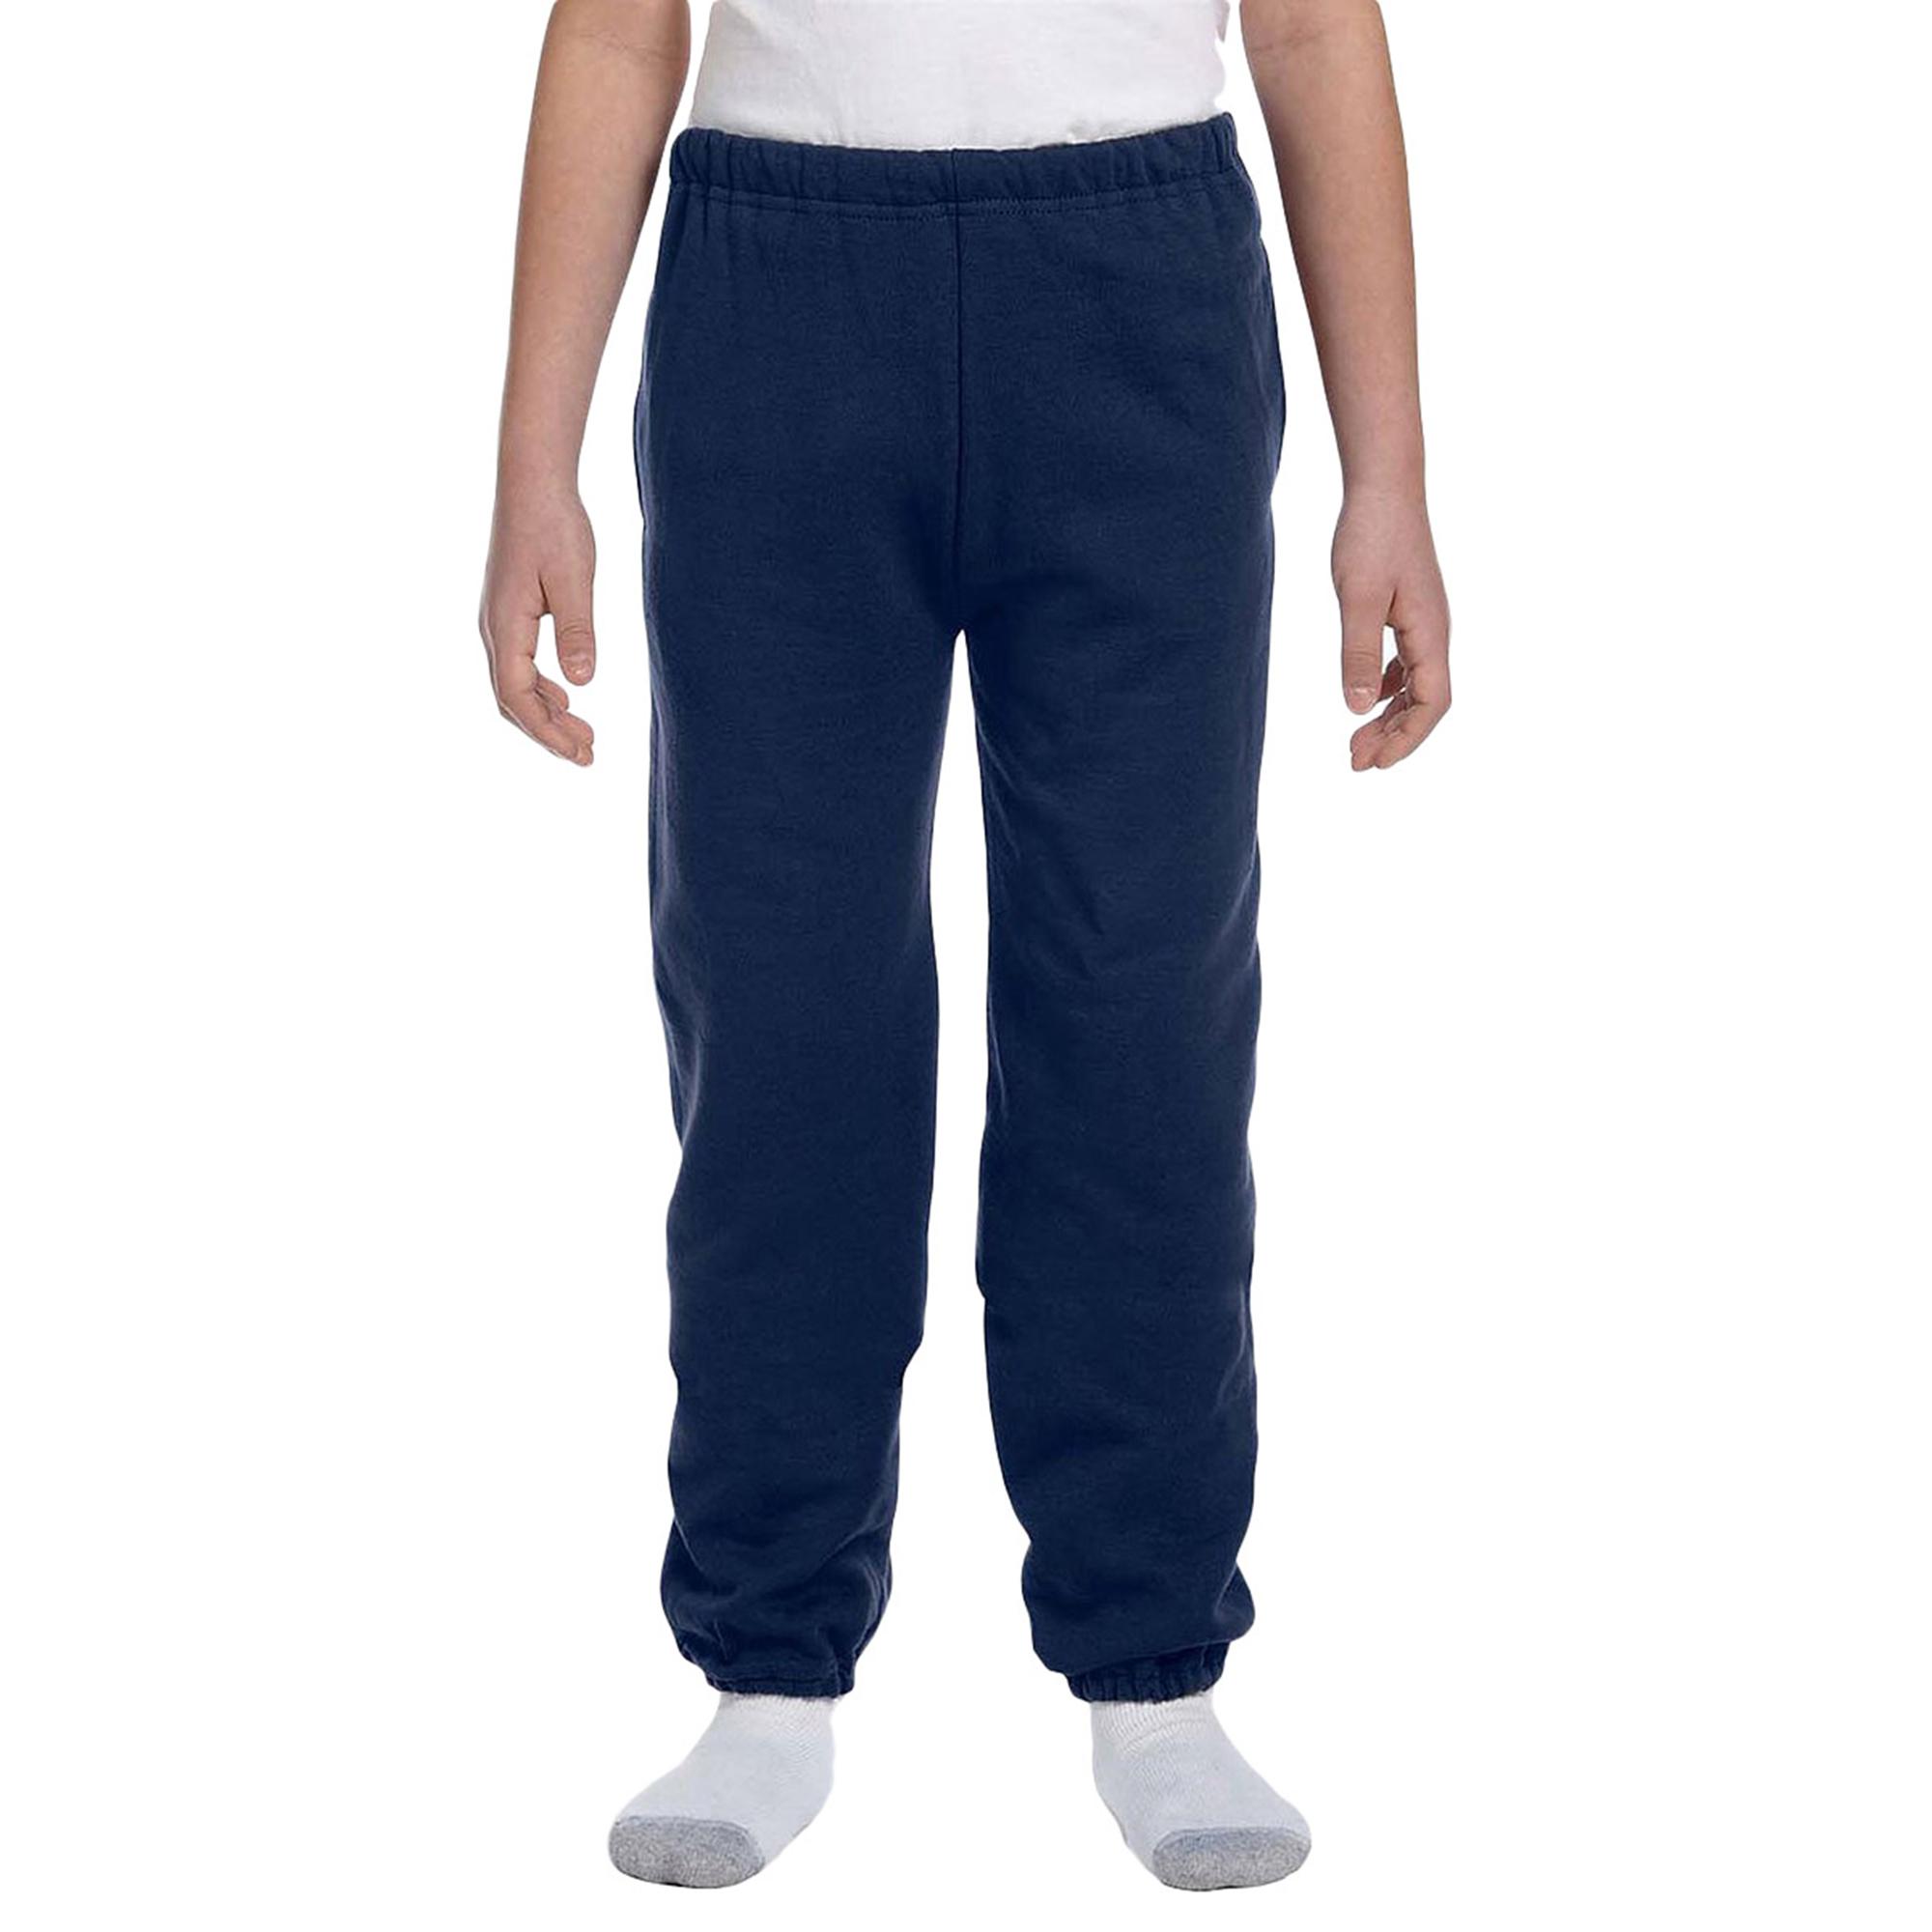 Jerzees 4950B Boy's Elastic Waistband Fleece Pockets Sports Jersey Sweatpants at Sears.com